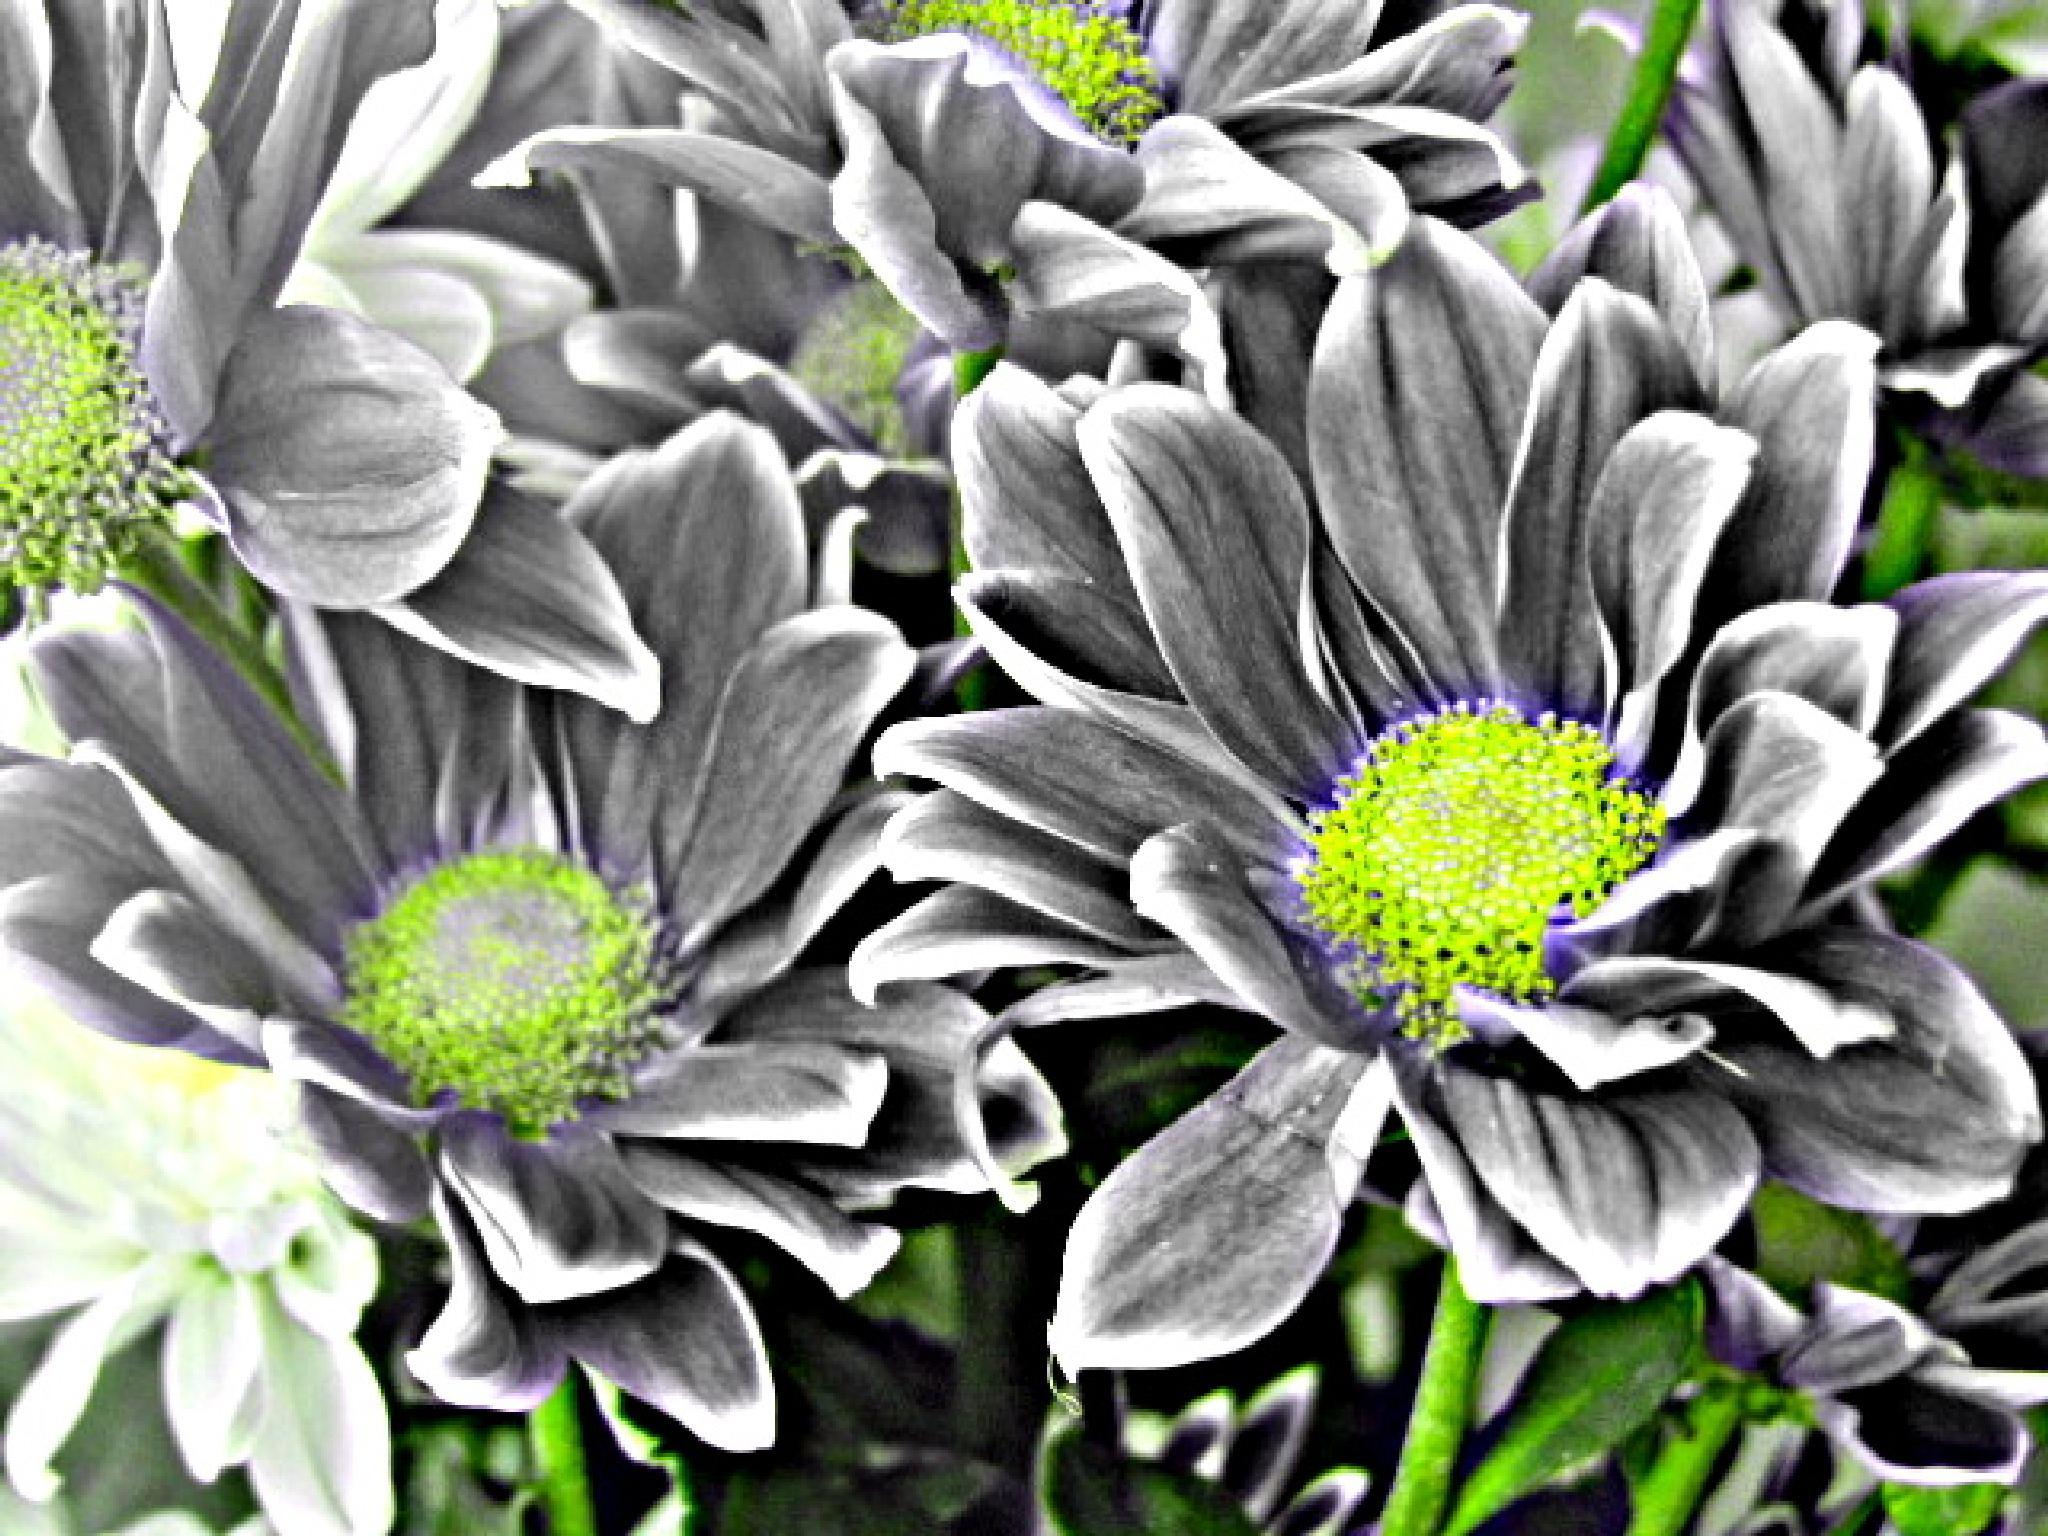 Blackandwhite by sarah2608